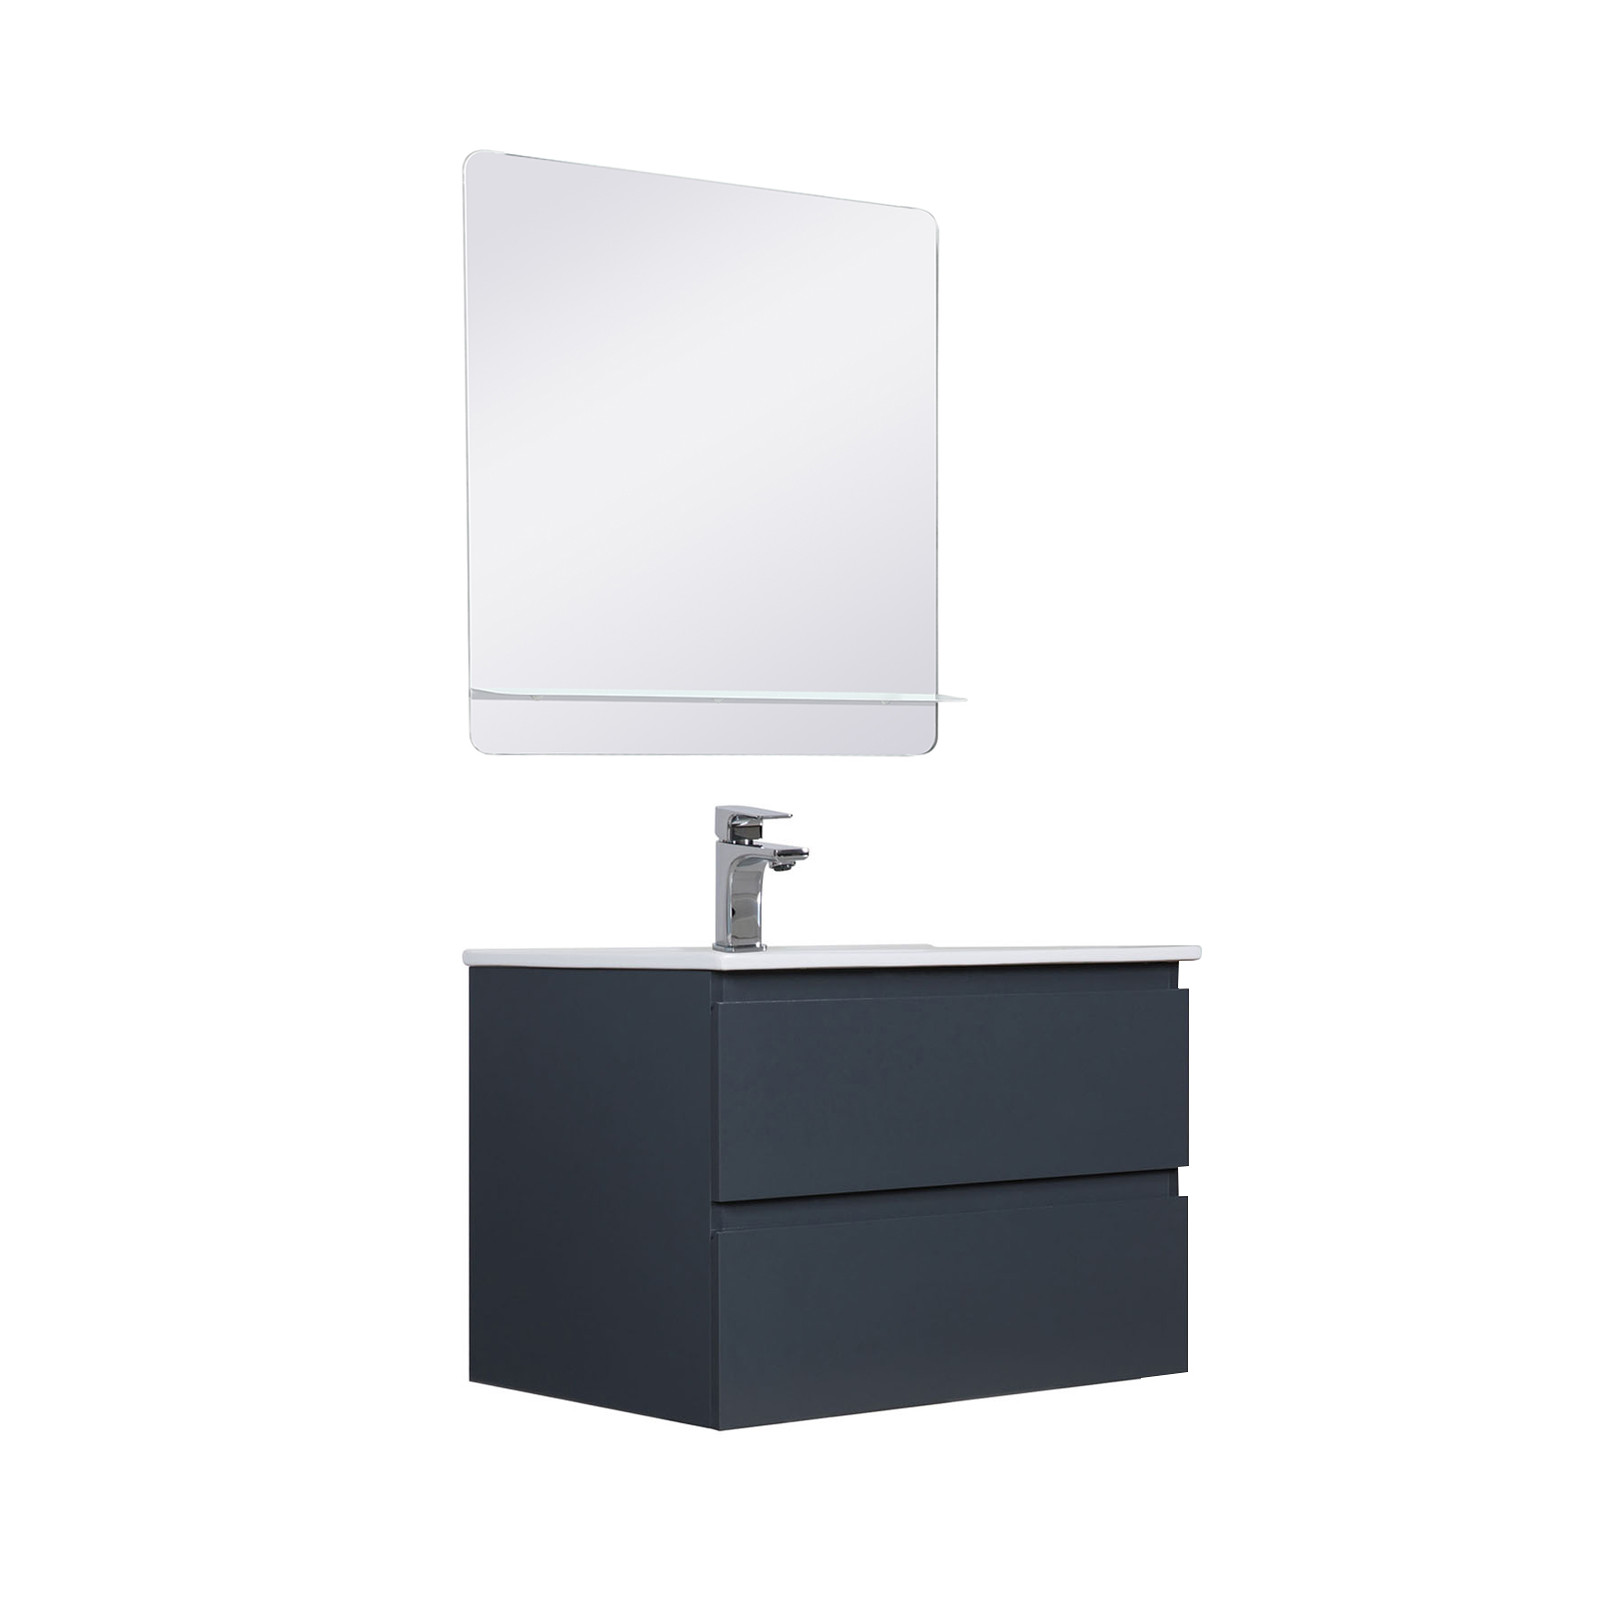 Meuble Salle de Bain 60 cm Suspendu Gris Anthracite + Miroir SORRENTO